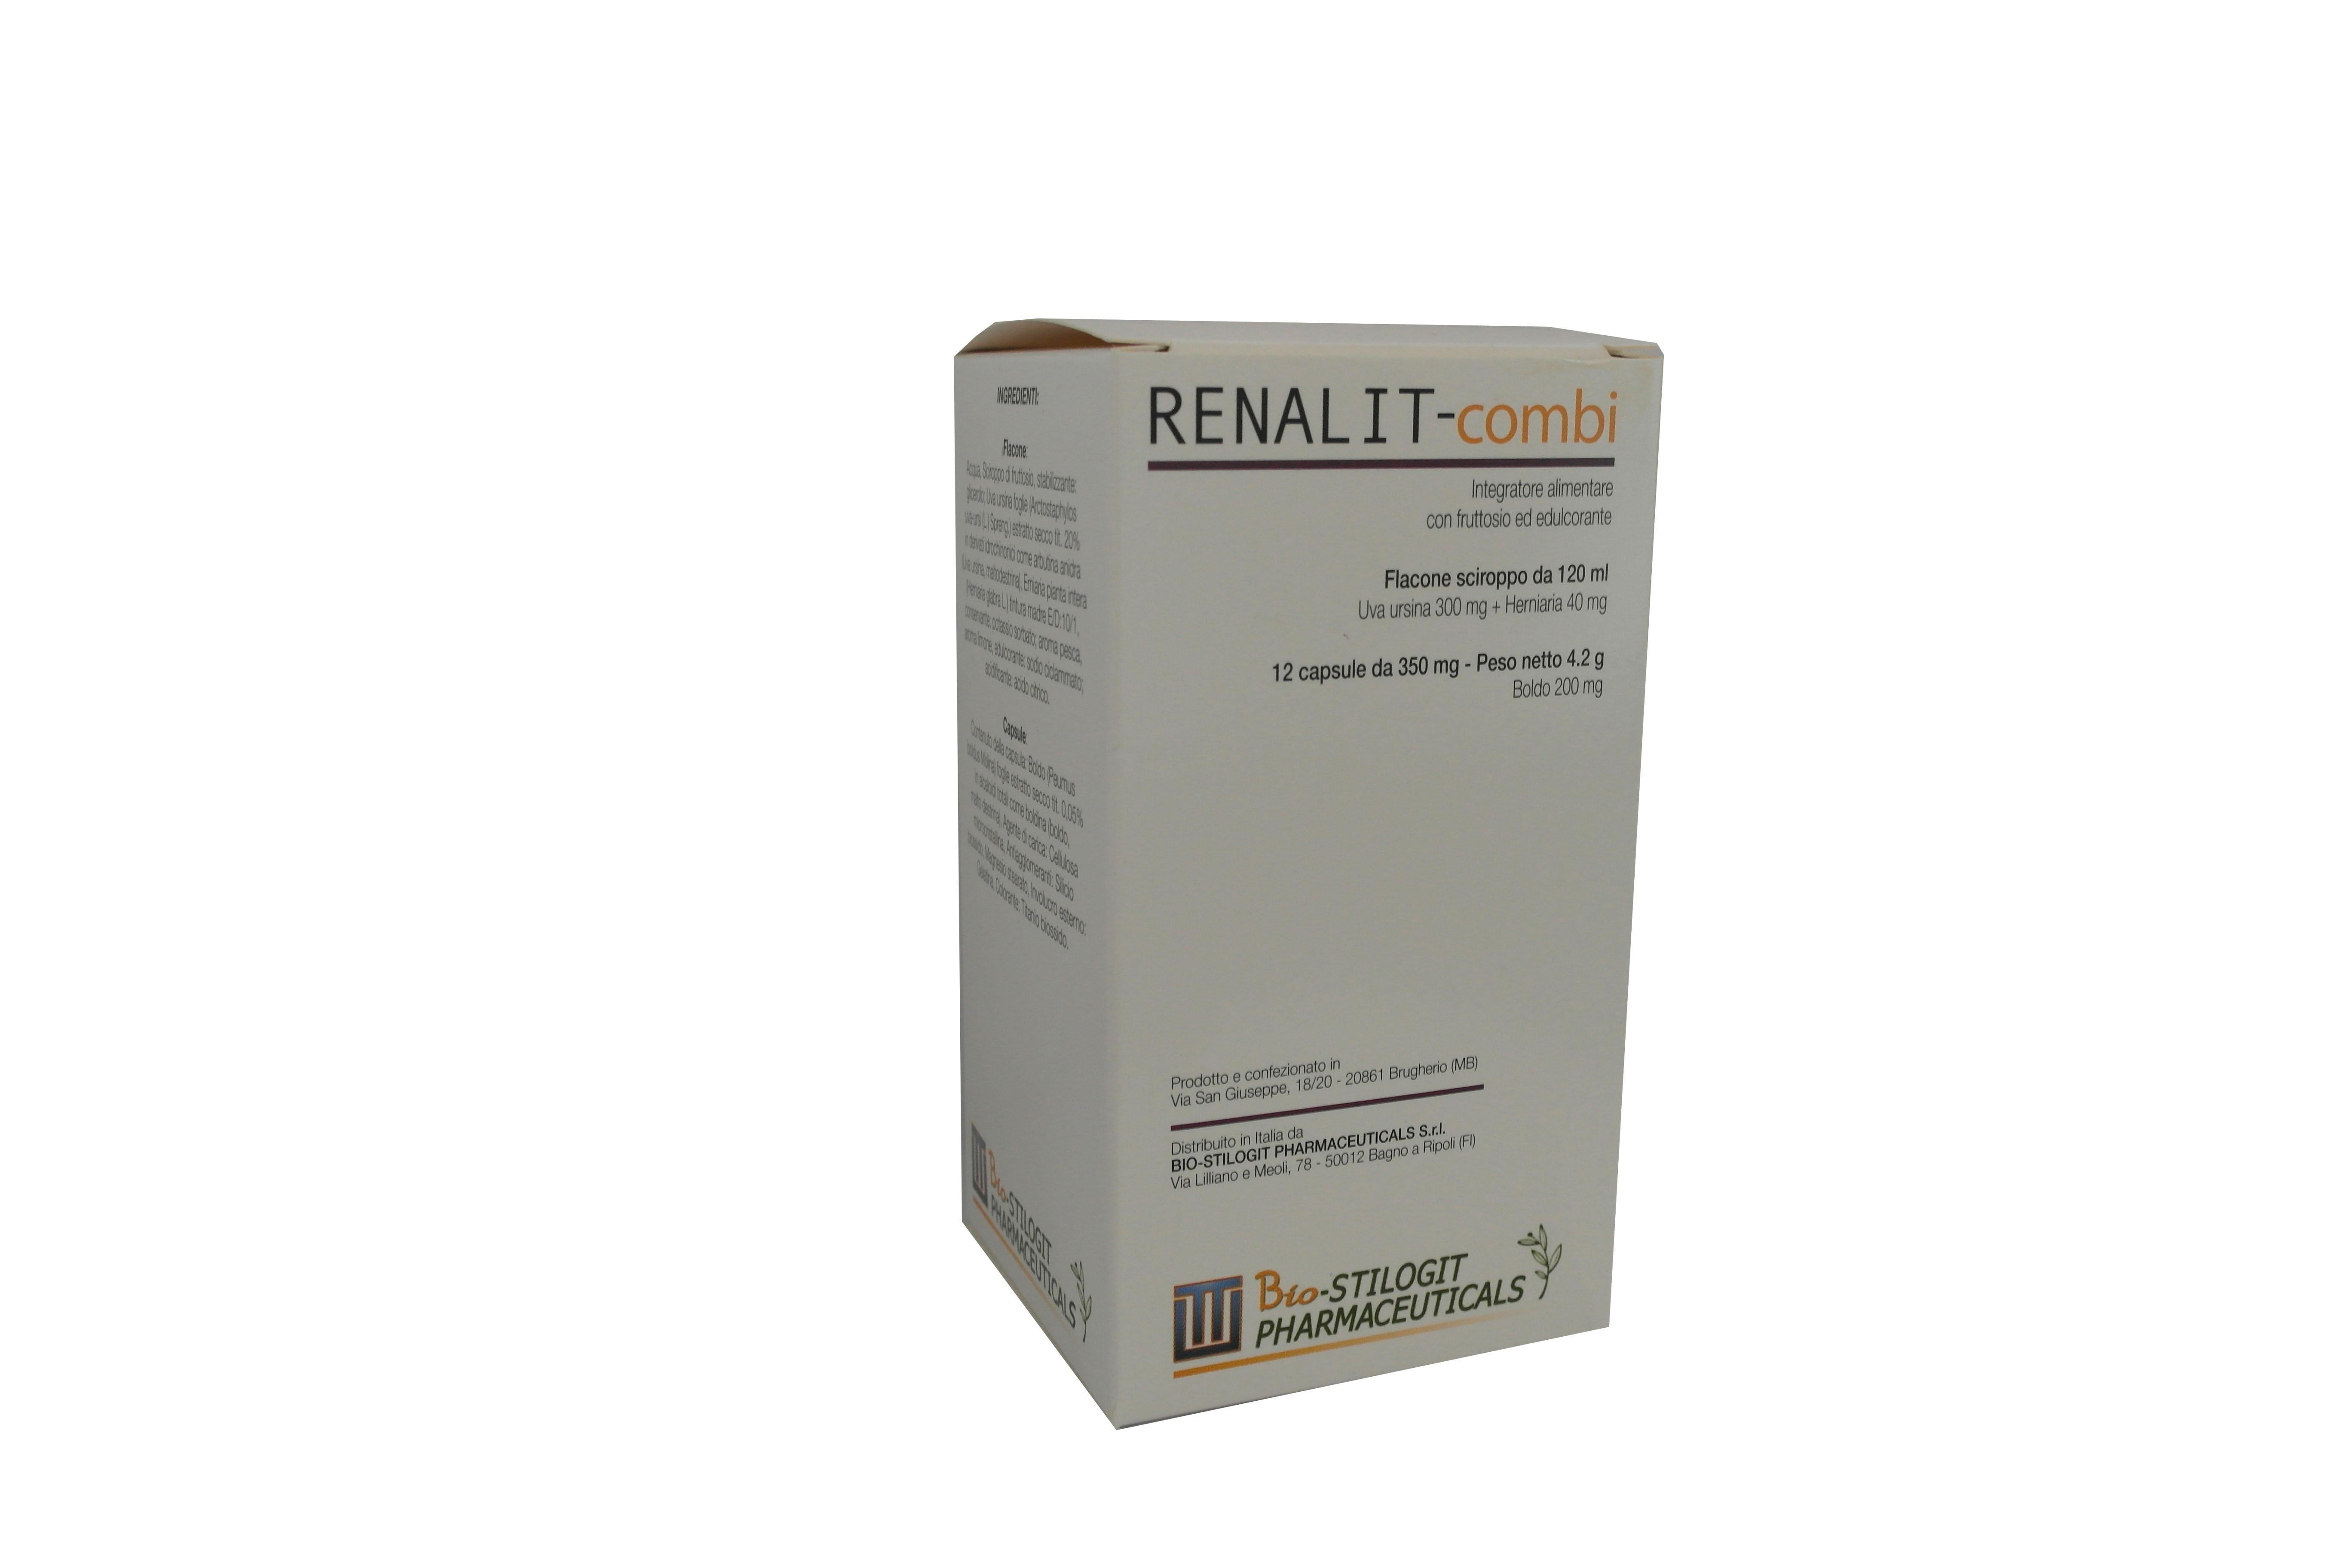 RENALIT-combi - 12 cpr + 120 ml sciroppo